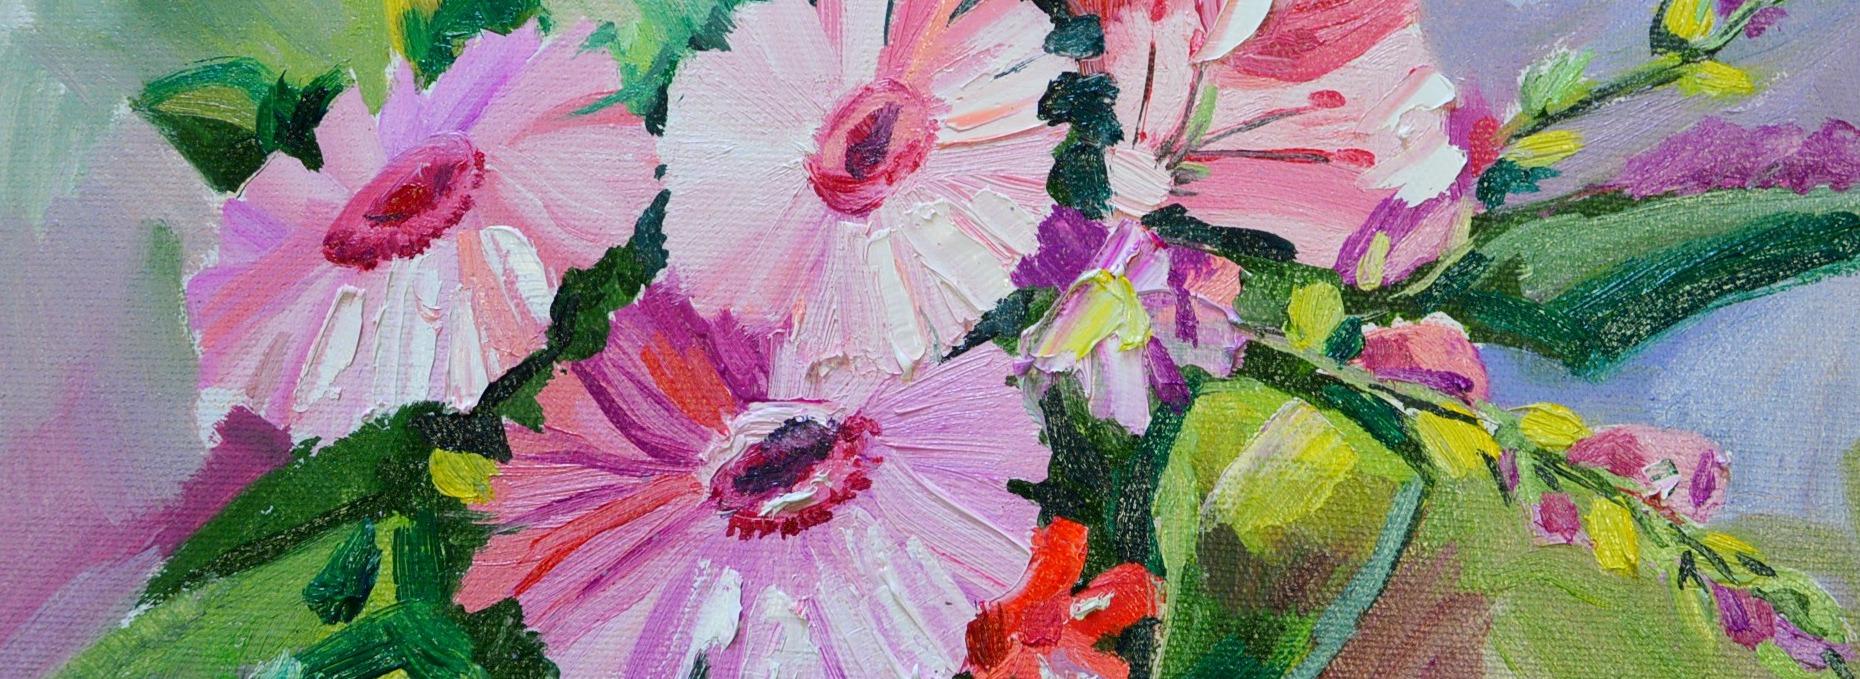 герберы, мало, цветы